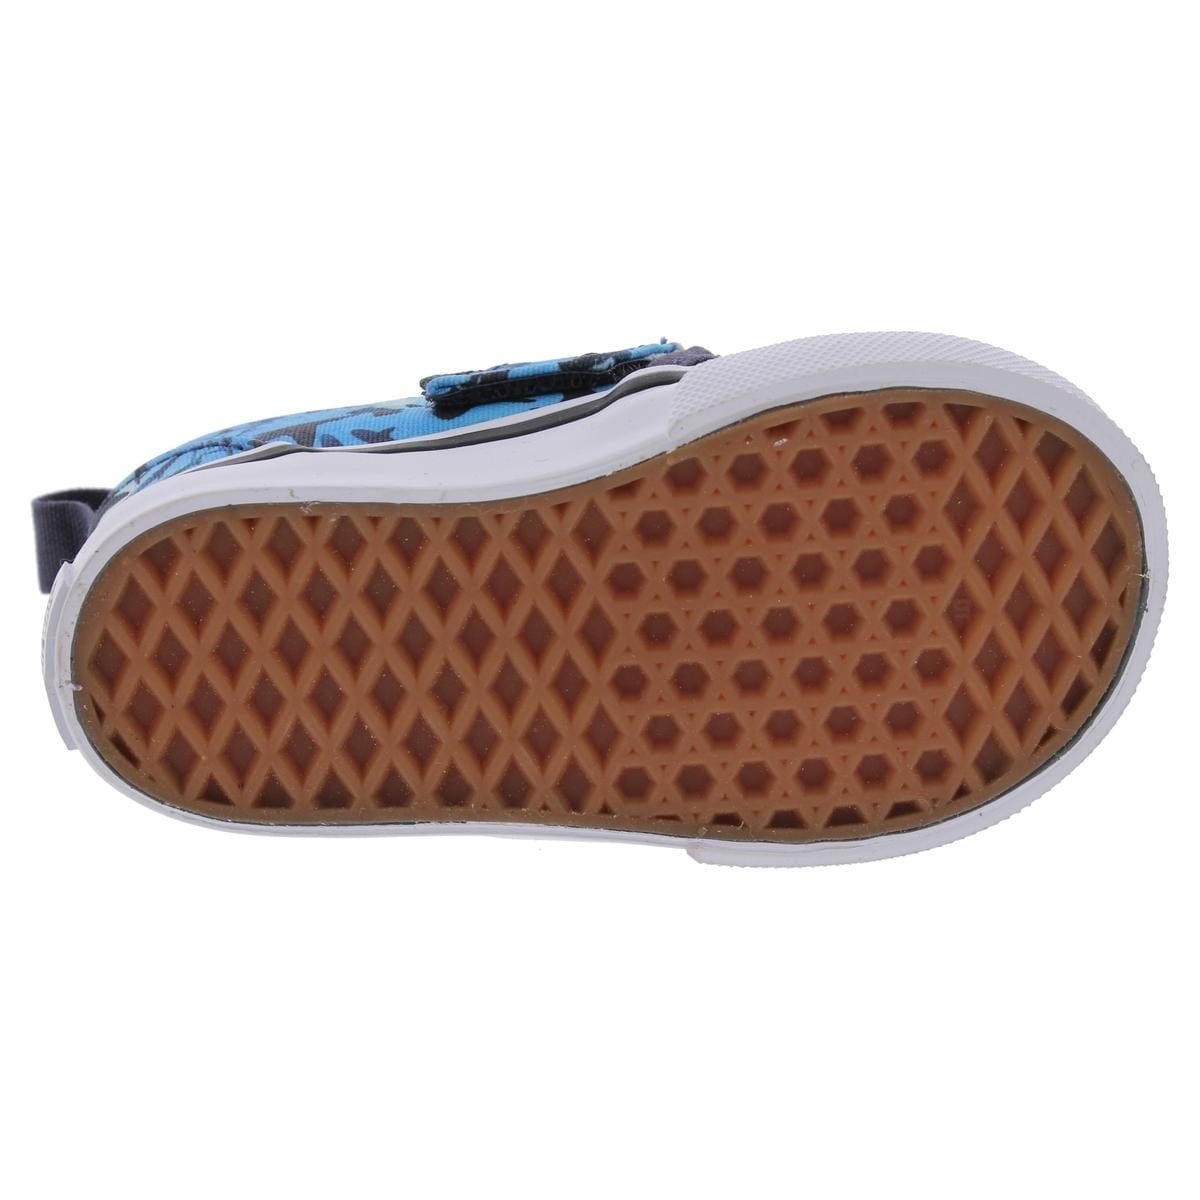 7c05656b17e996 Shop Vans Boys Digi Shark Skate Shoes Low Top Lightweight - 4 medium (d)  toddler - Free Shipping On Orders Over  45 - Overstock - 20742618